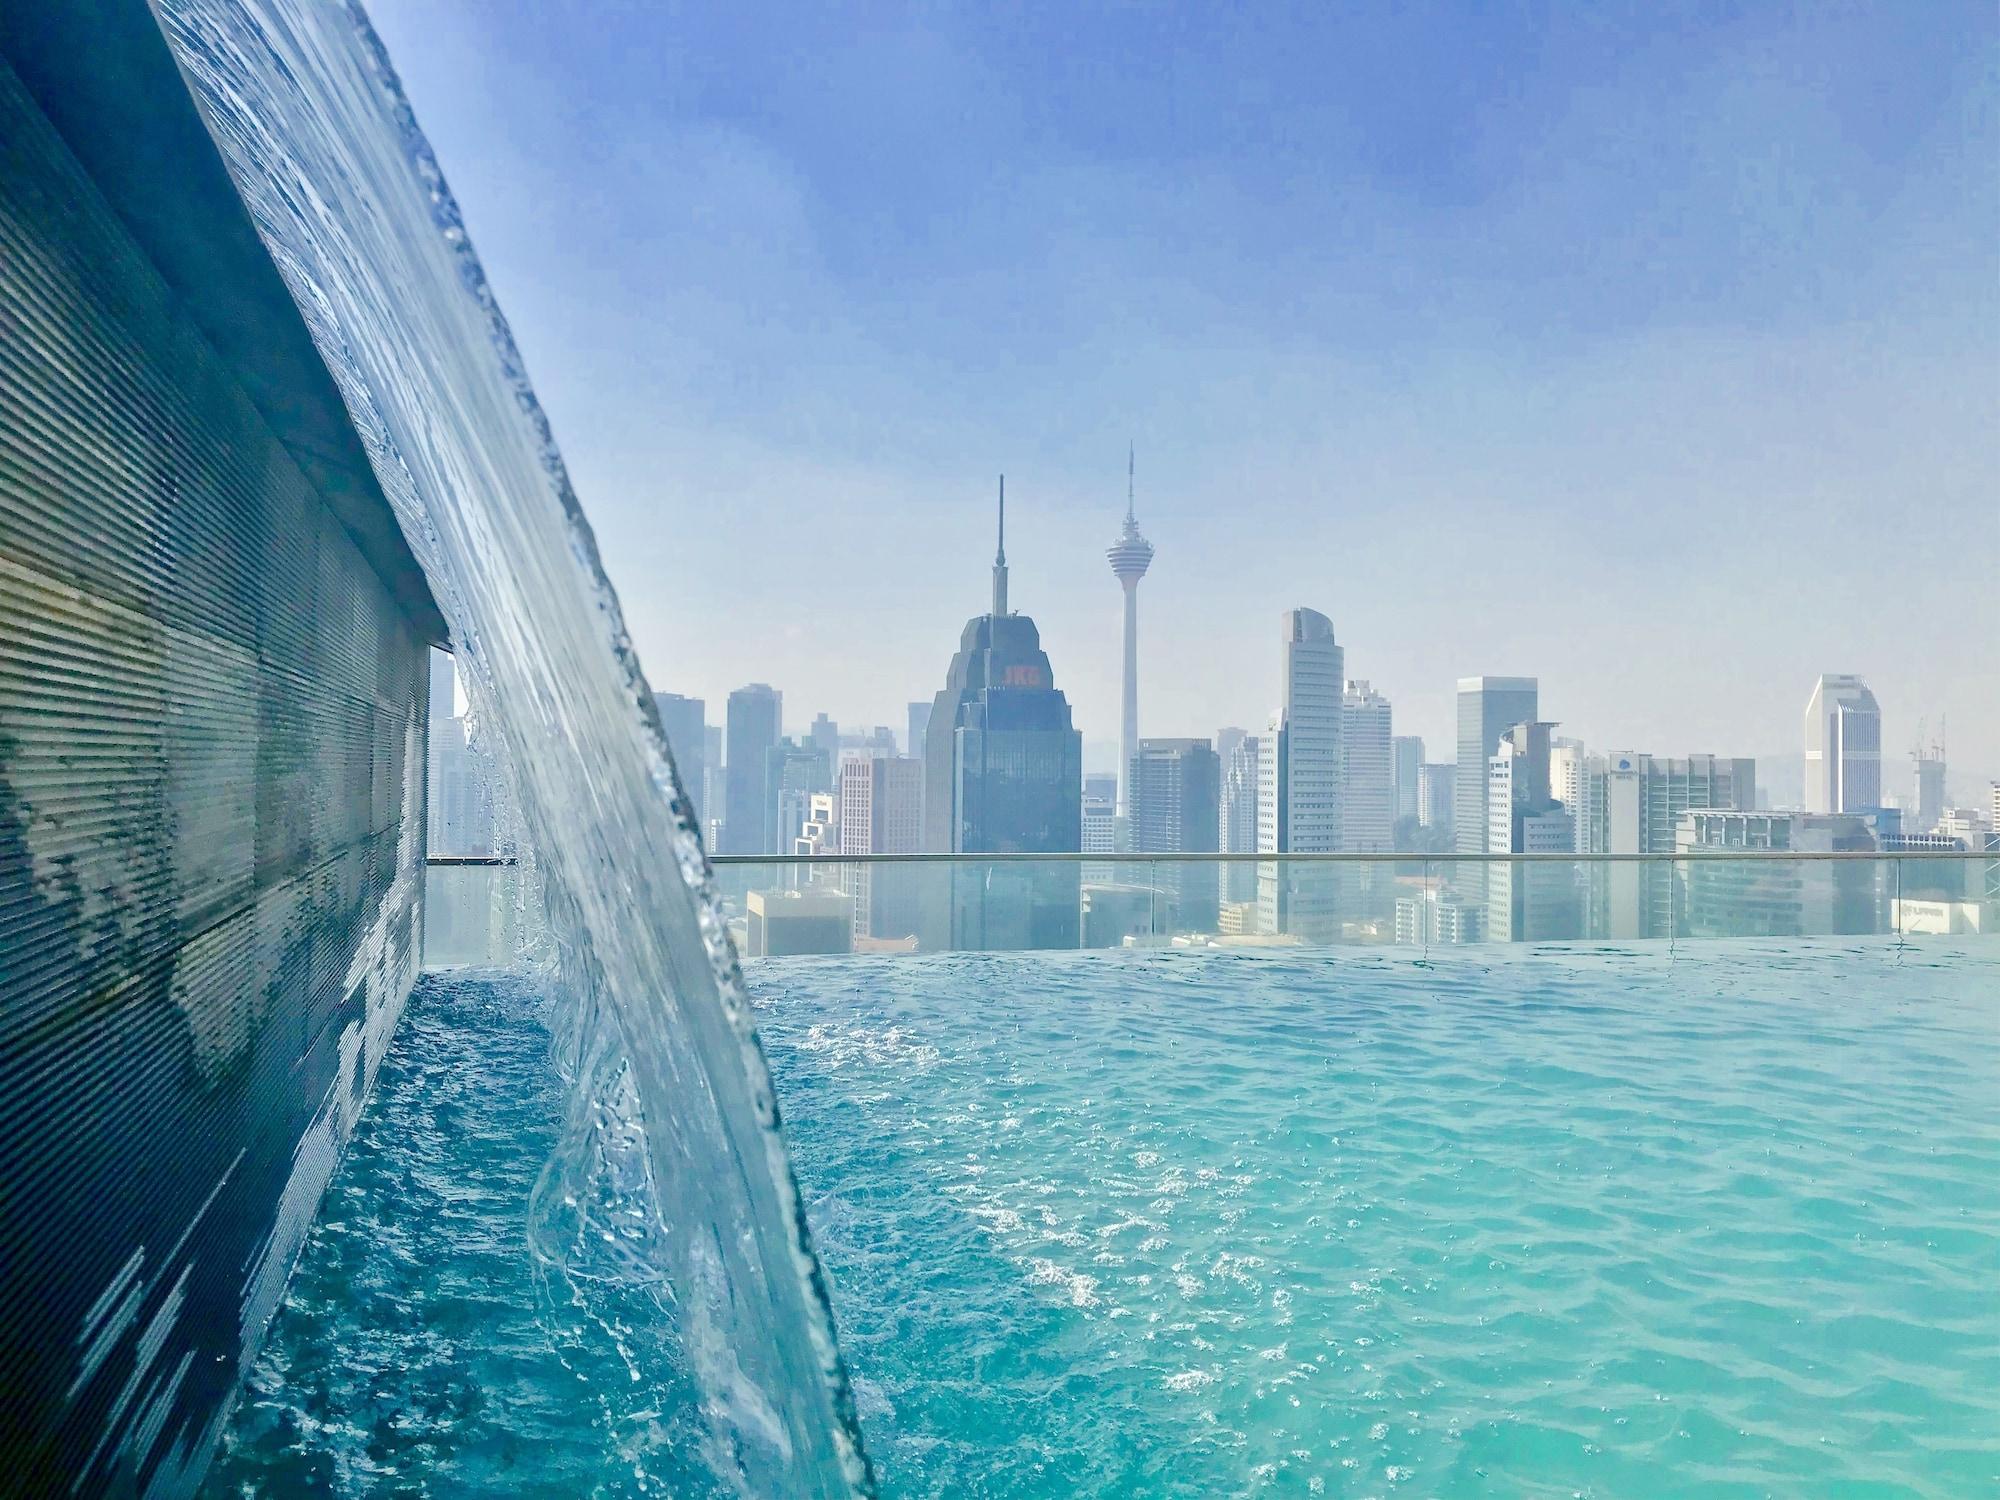 Regalia Suites 101, Kuala Lumpur